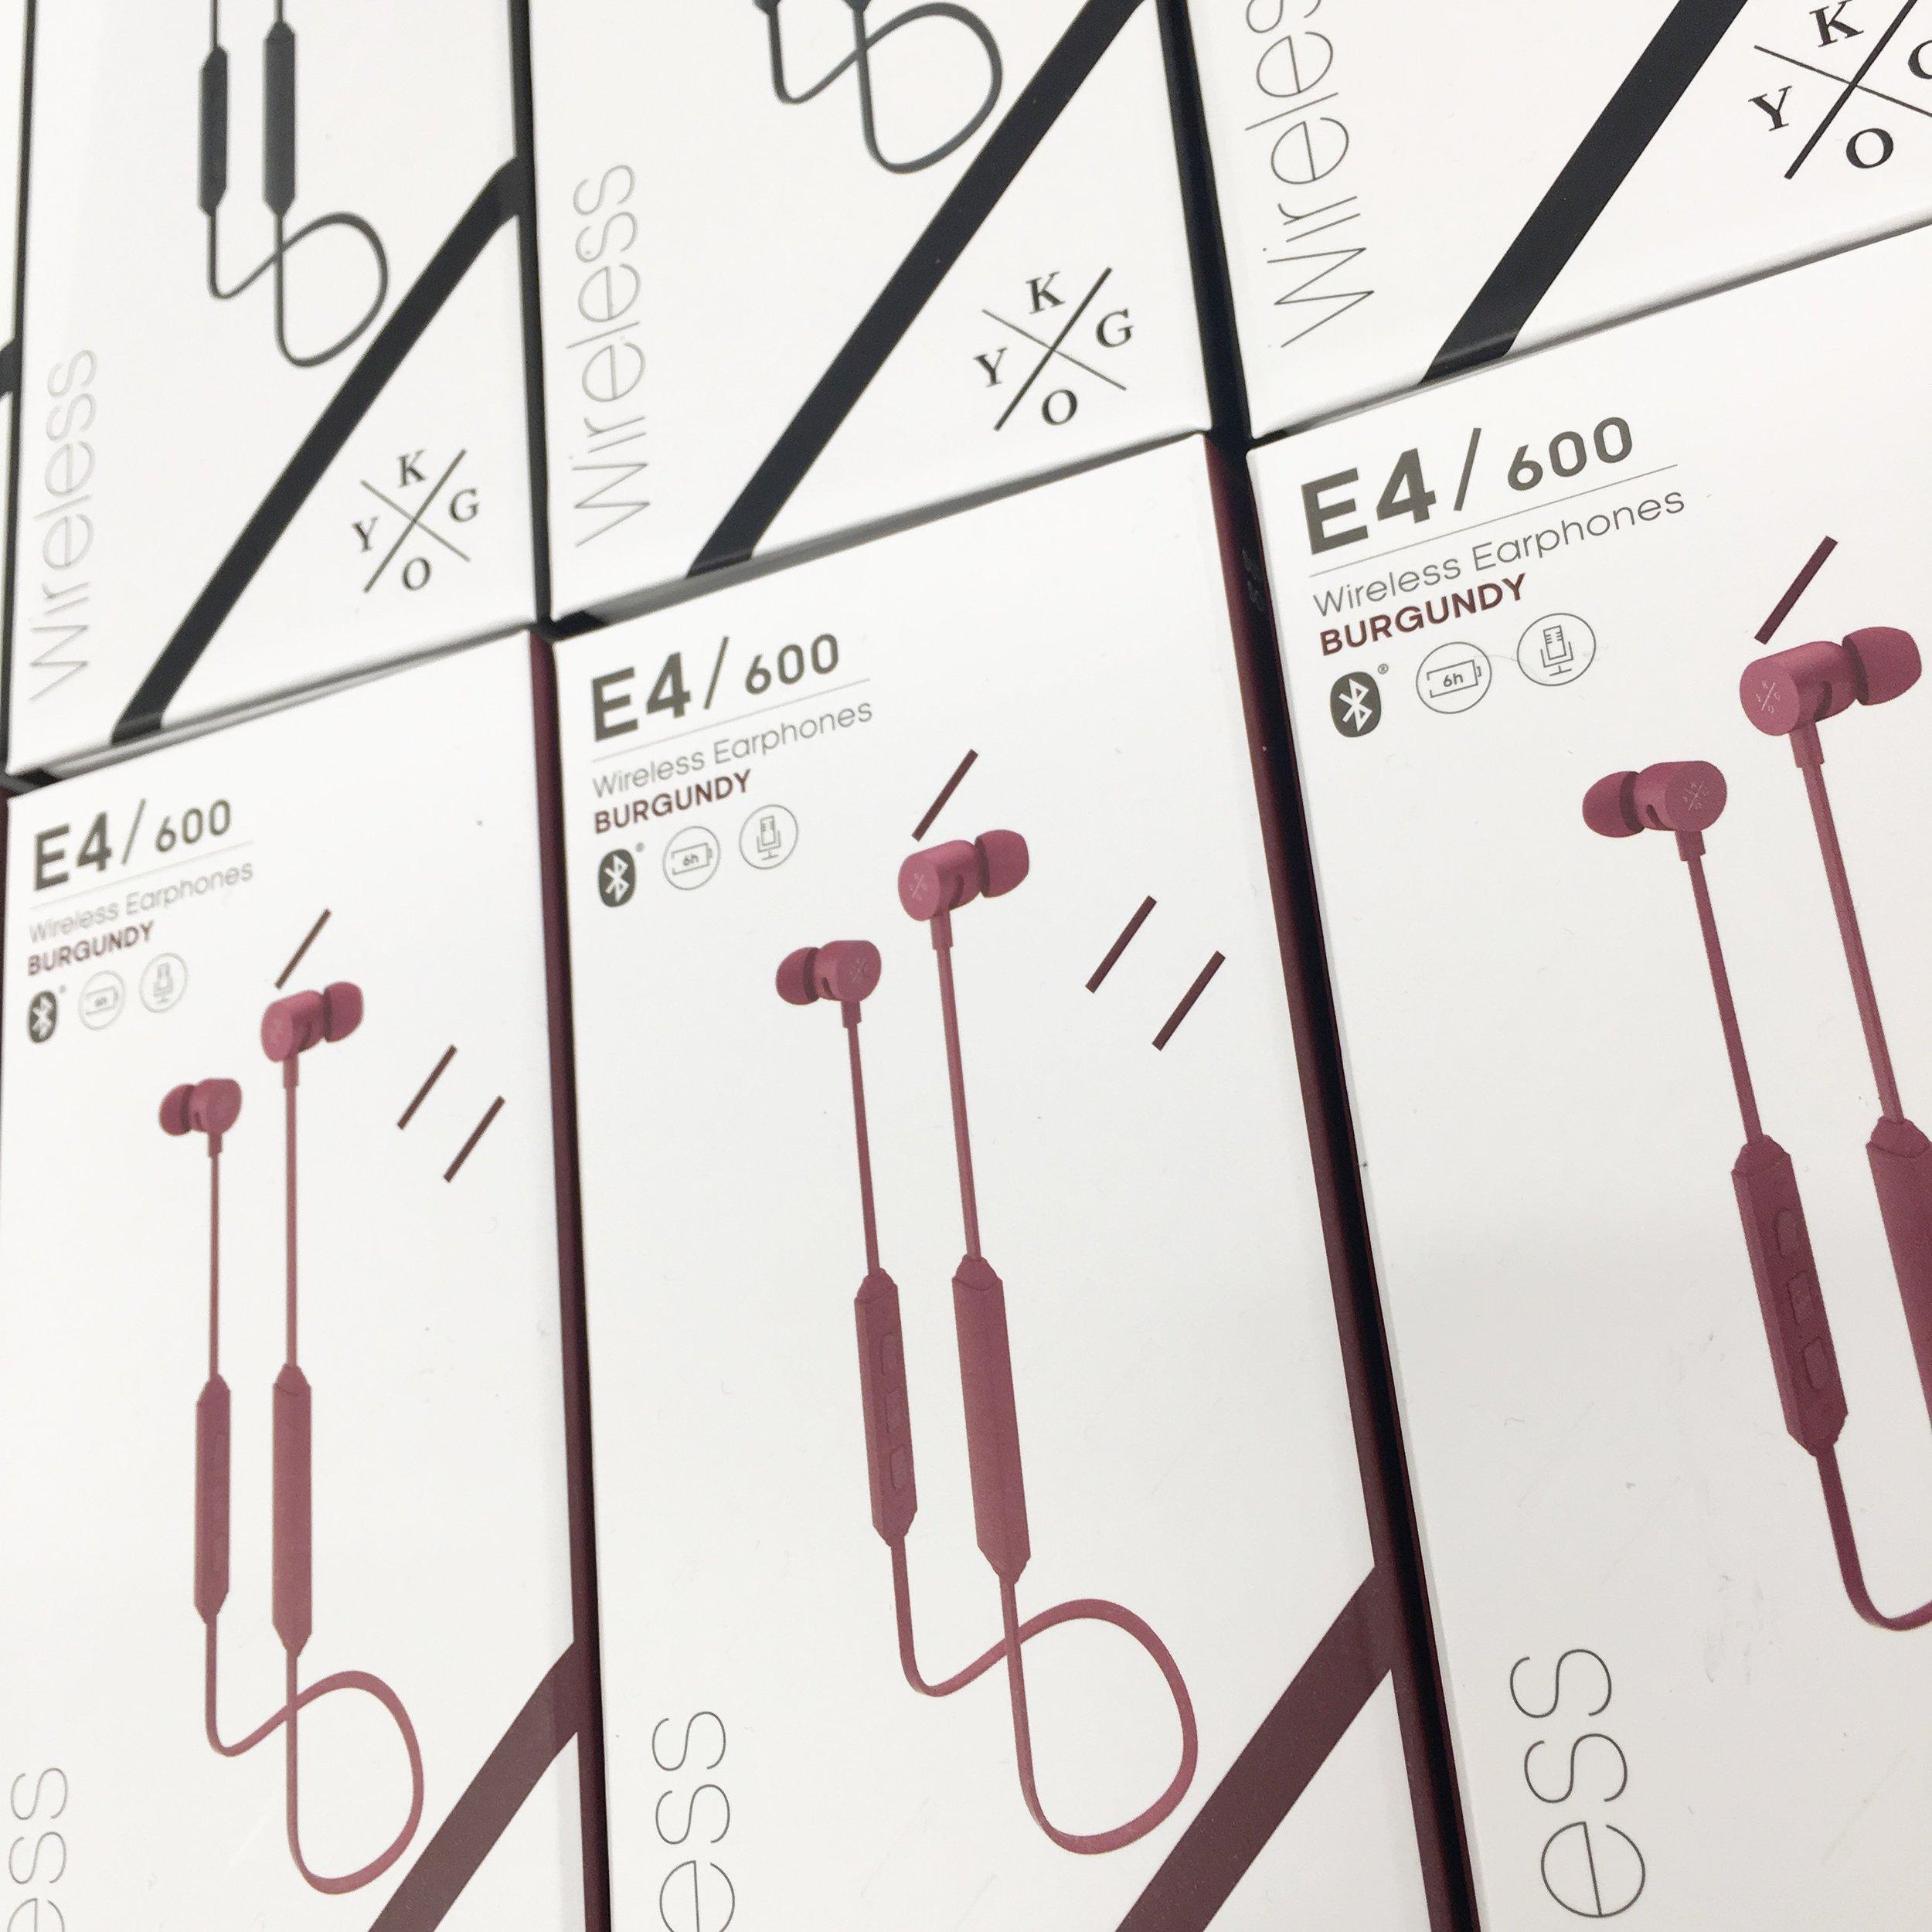 kygo-life-head-phones-e4-600-pivot-produktdesign-visuals-vray.JPG